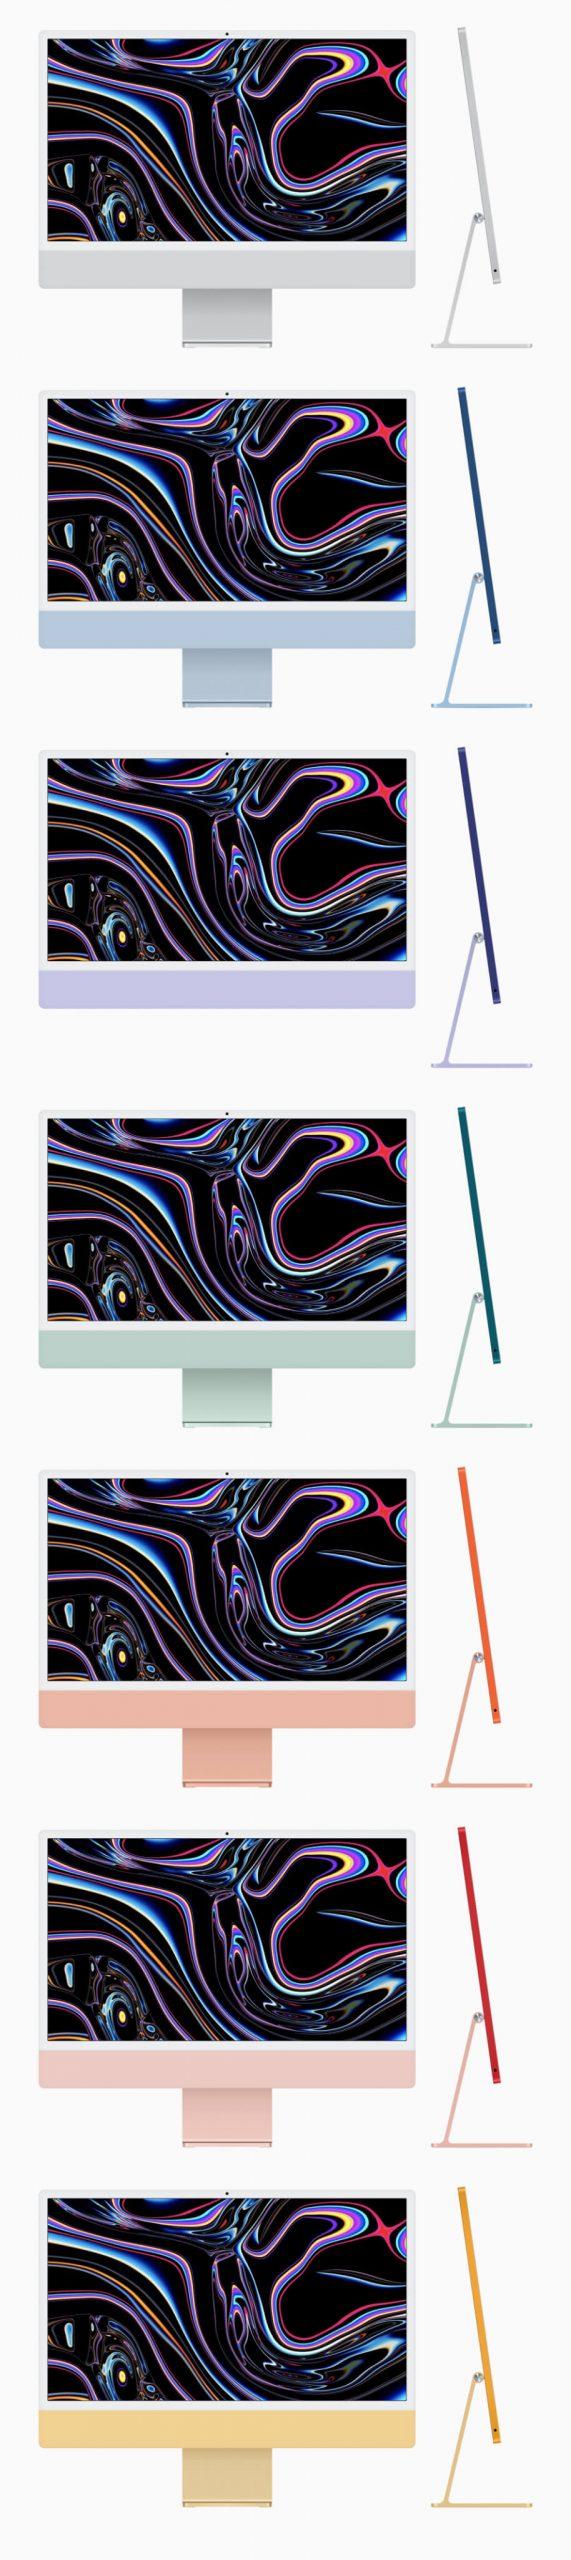 iMac 24 Inch Mockup Free - UI Freebies